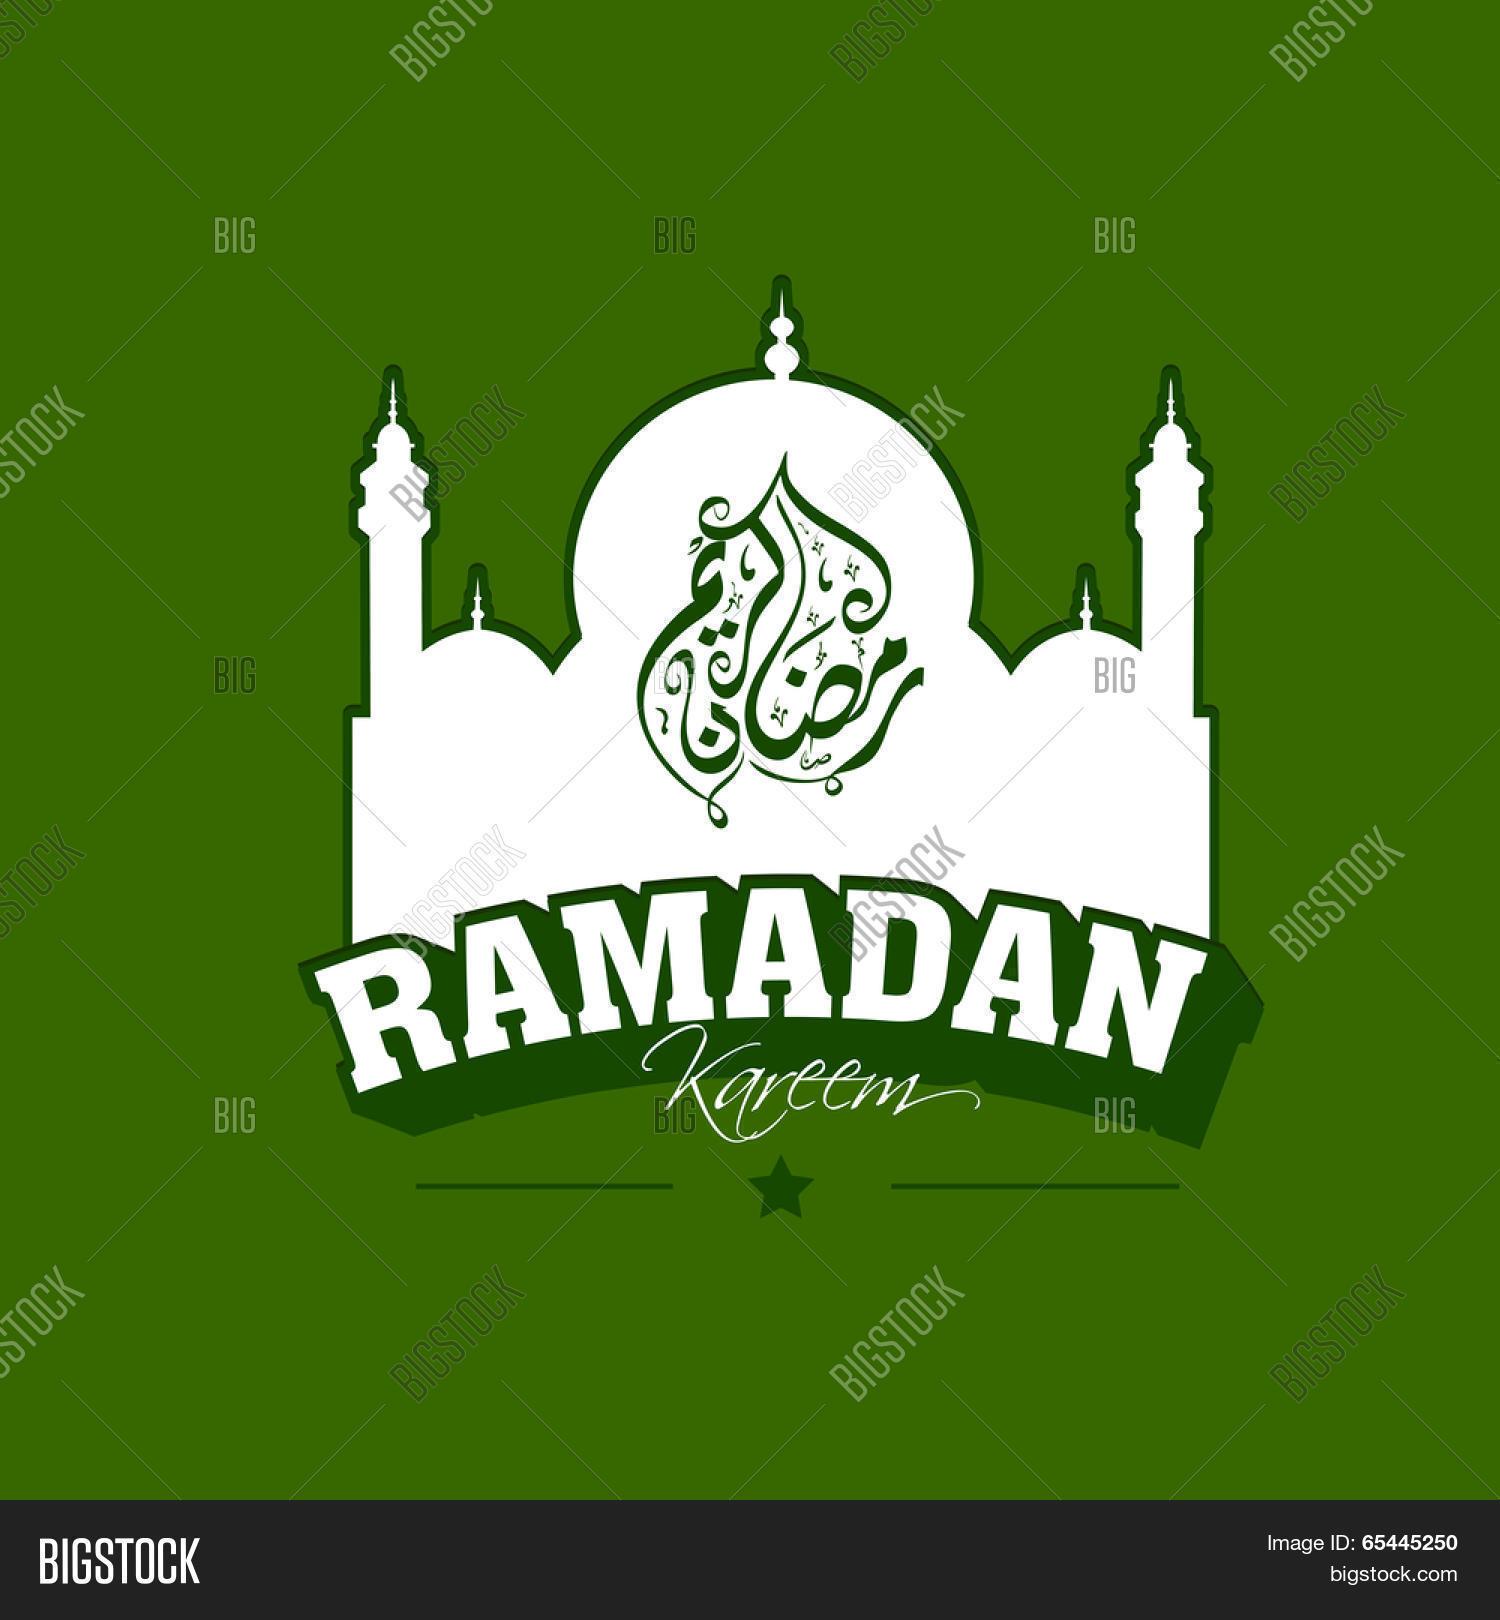 Mosque background for ramadan kareem stock photography image - Arabic Islamic Calligraphy Of Text Ramadan Kareem With Mosque On Green Background Vintage Flyer